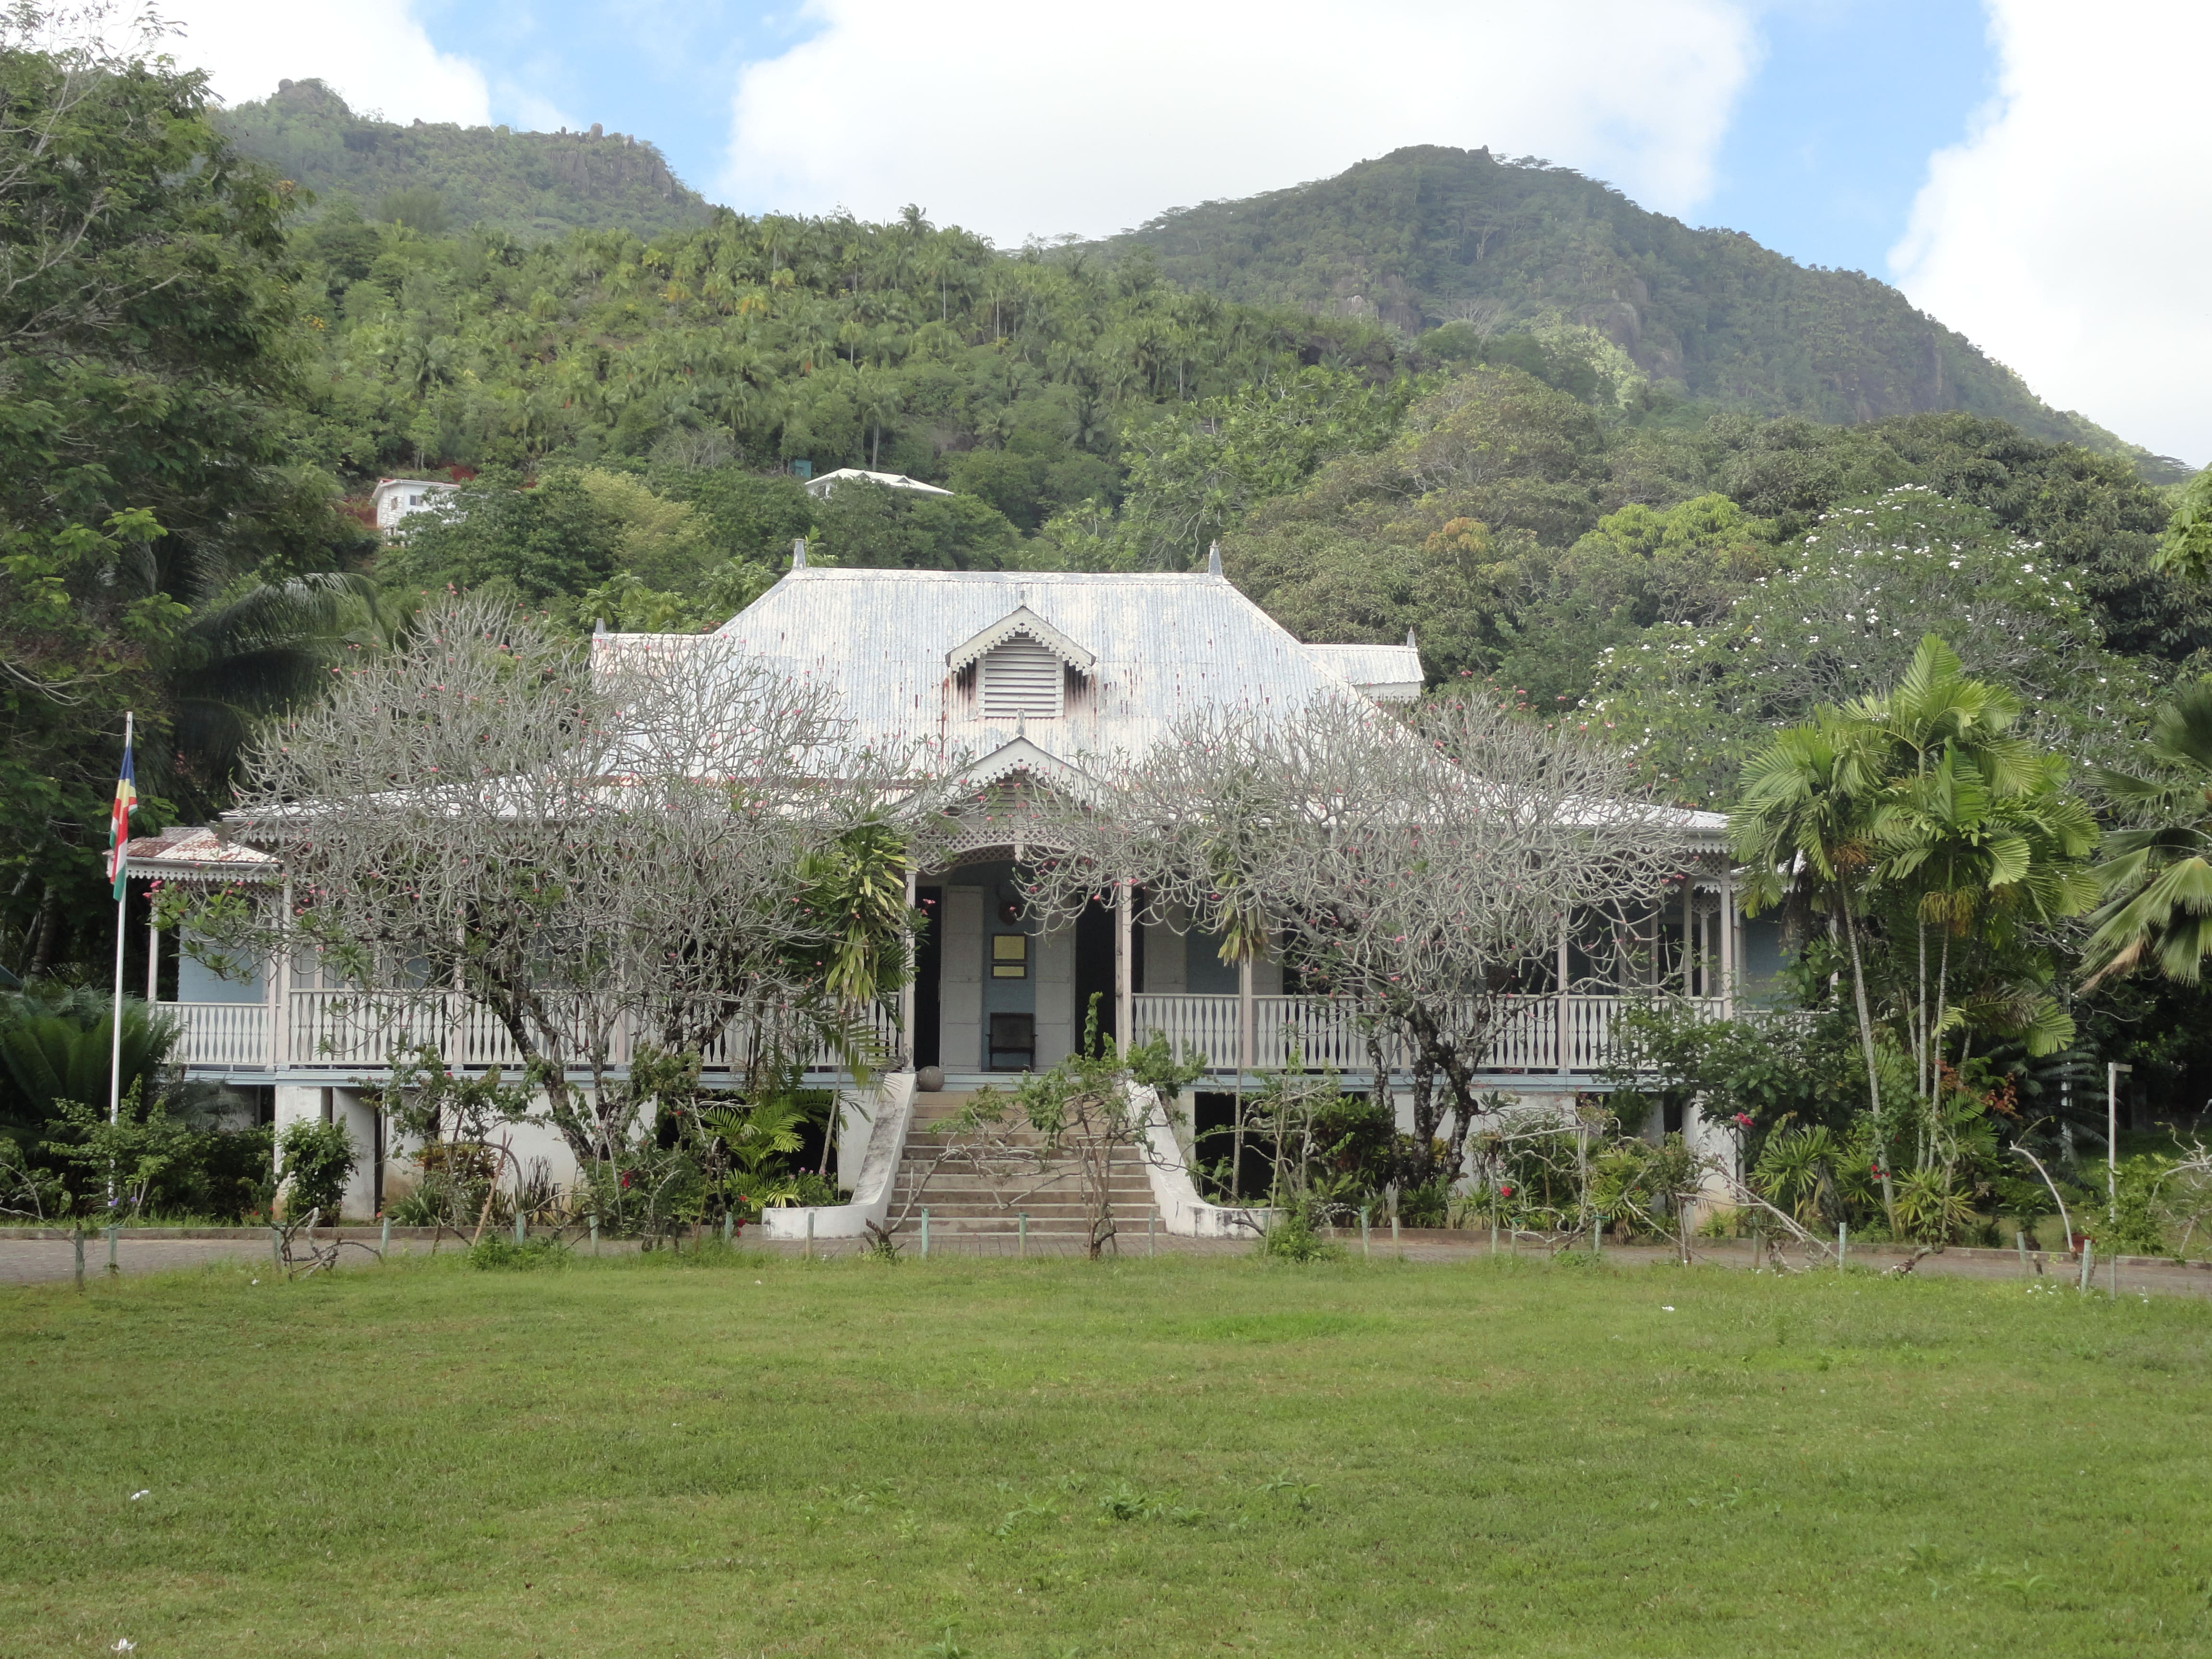 The 'Gran Kaz' Plantation House at the craft village. |©fabio chilli/flickr